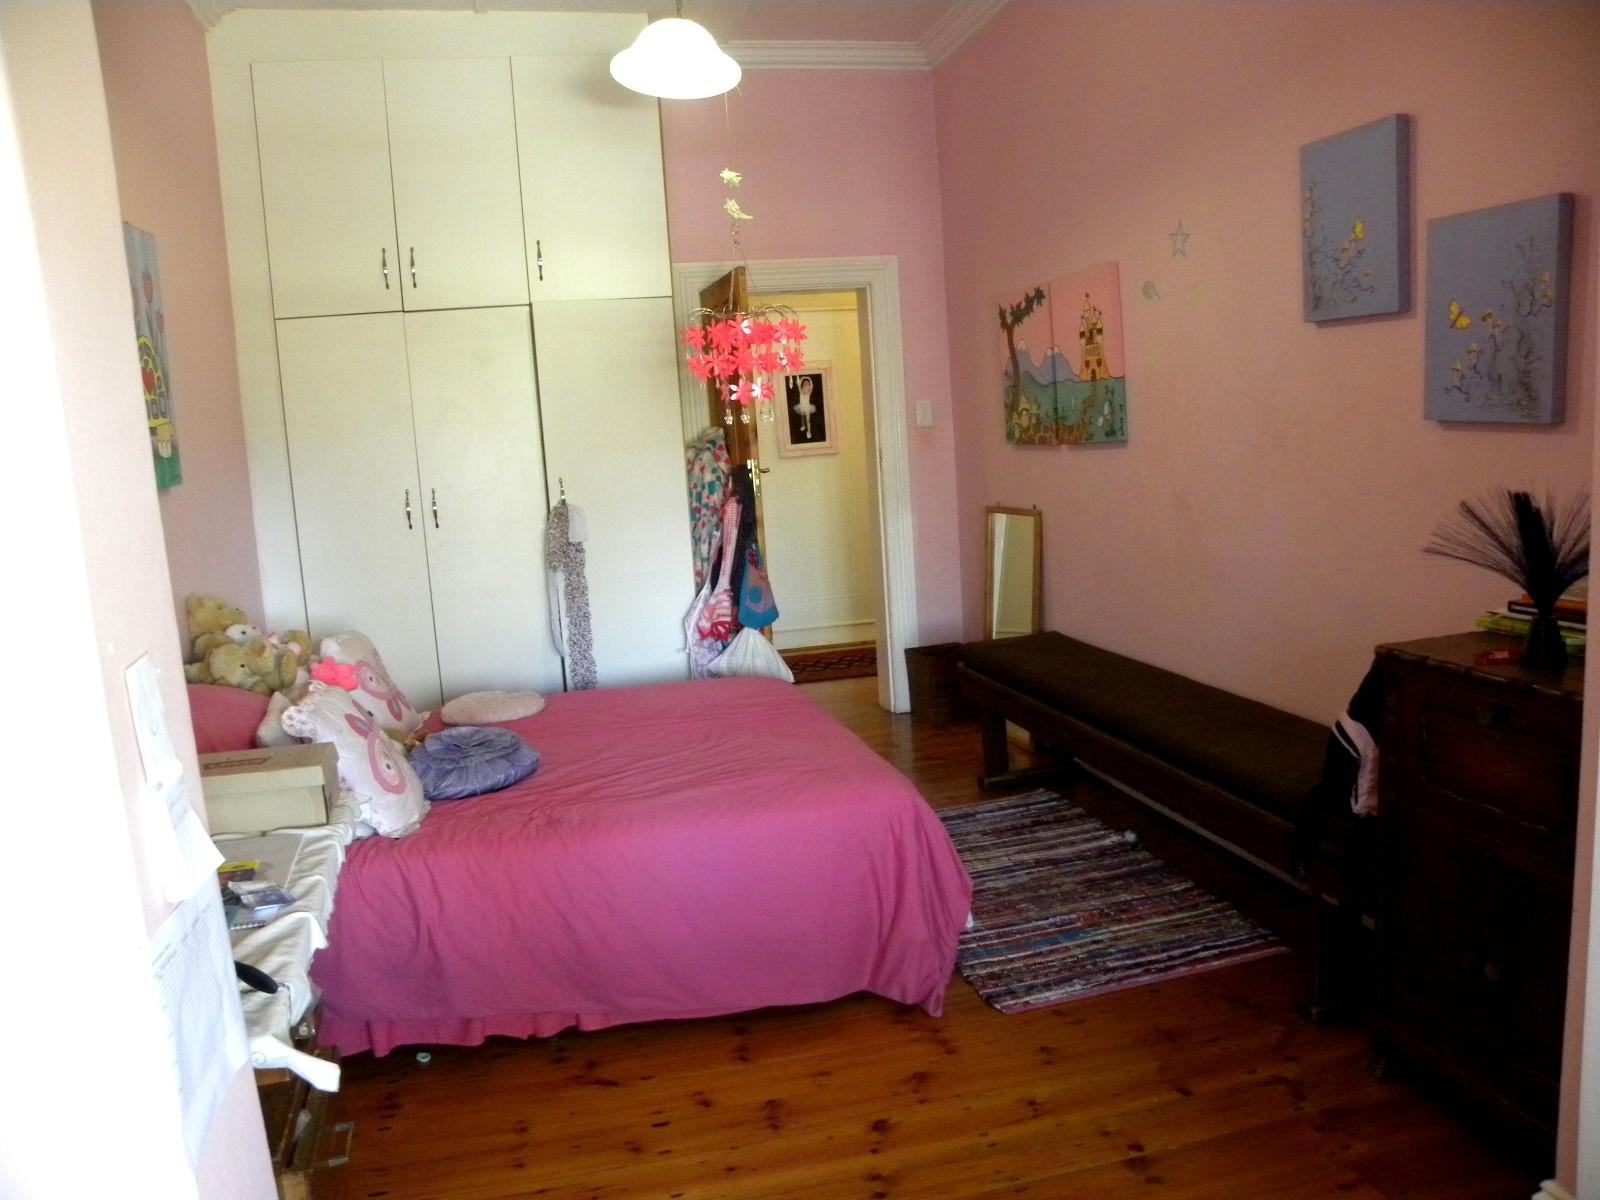 Bonnie Doone property for sale. Ref No: 13229687. Picture no 15